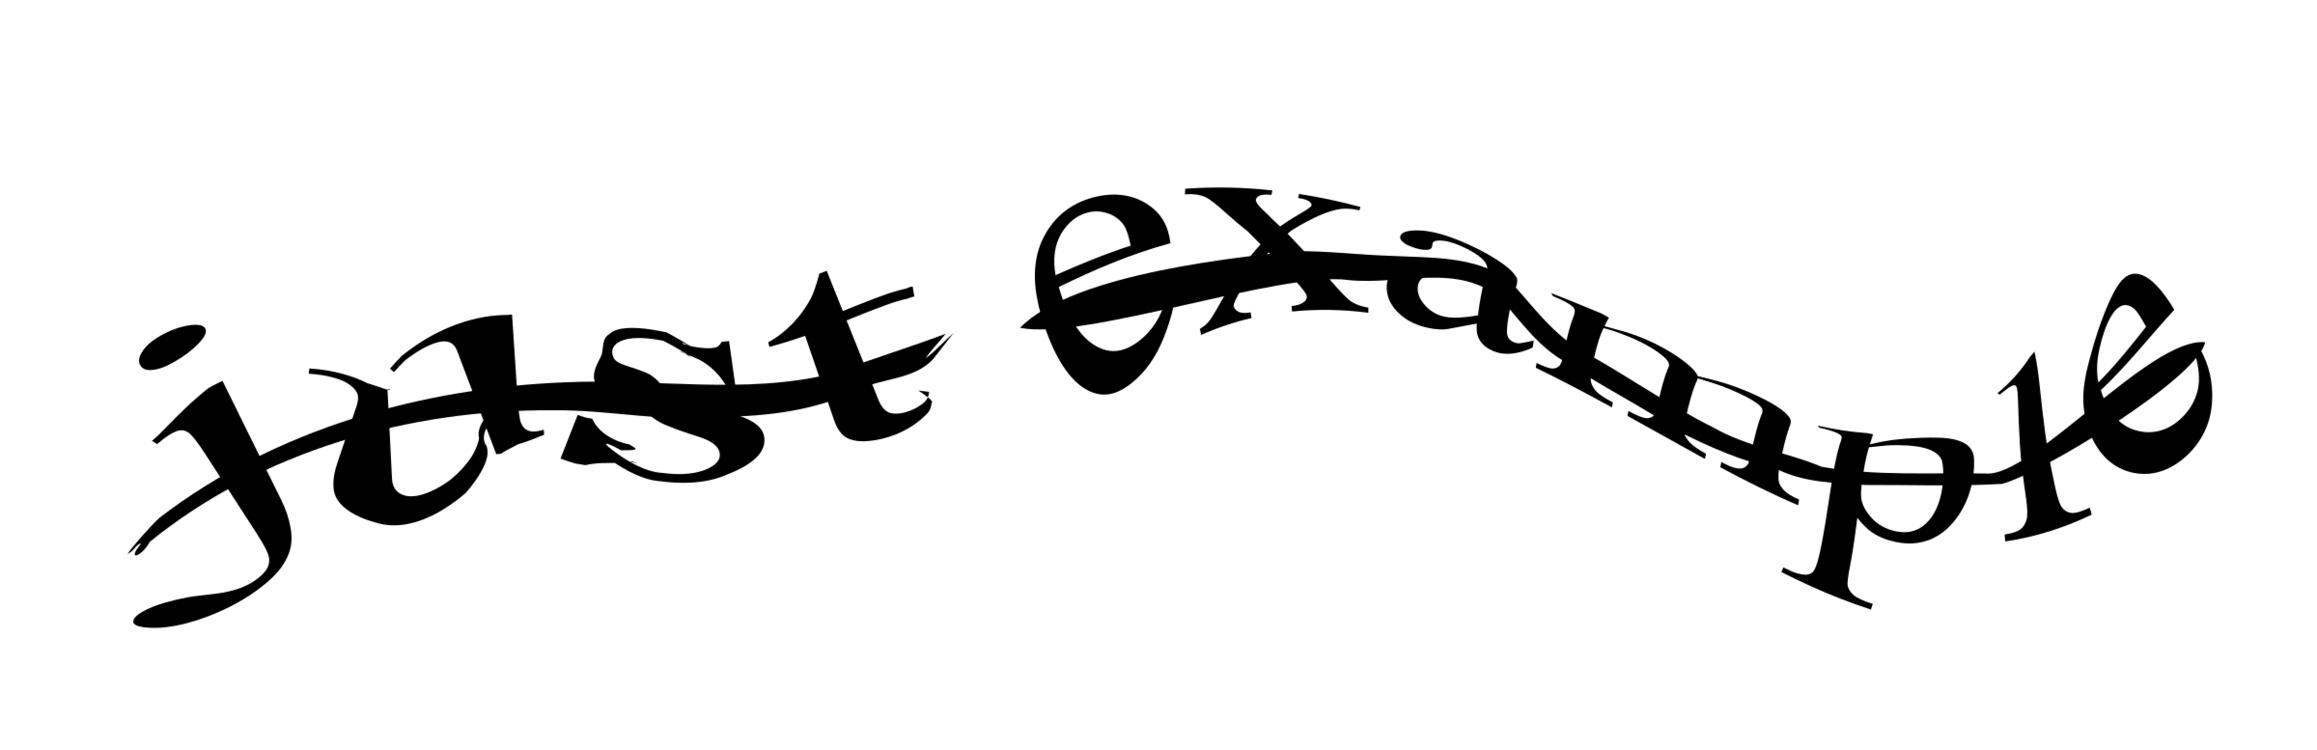 captcha black and white free list symbol e-authentication free